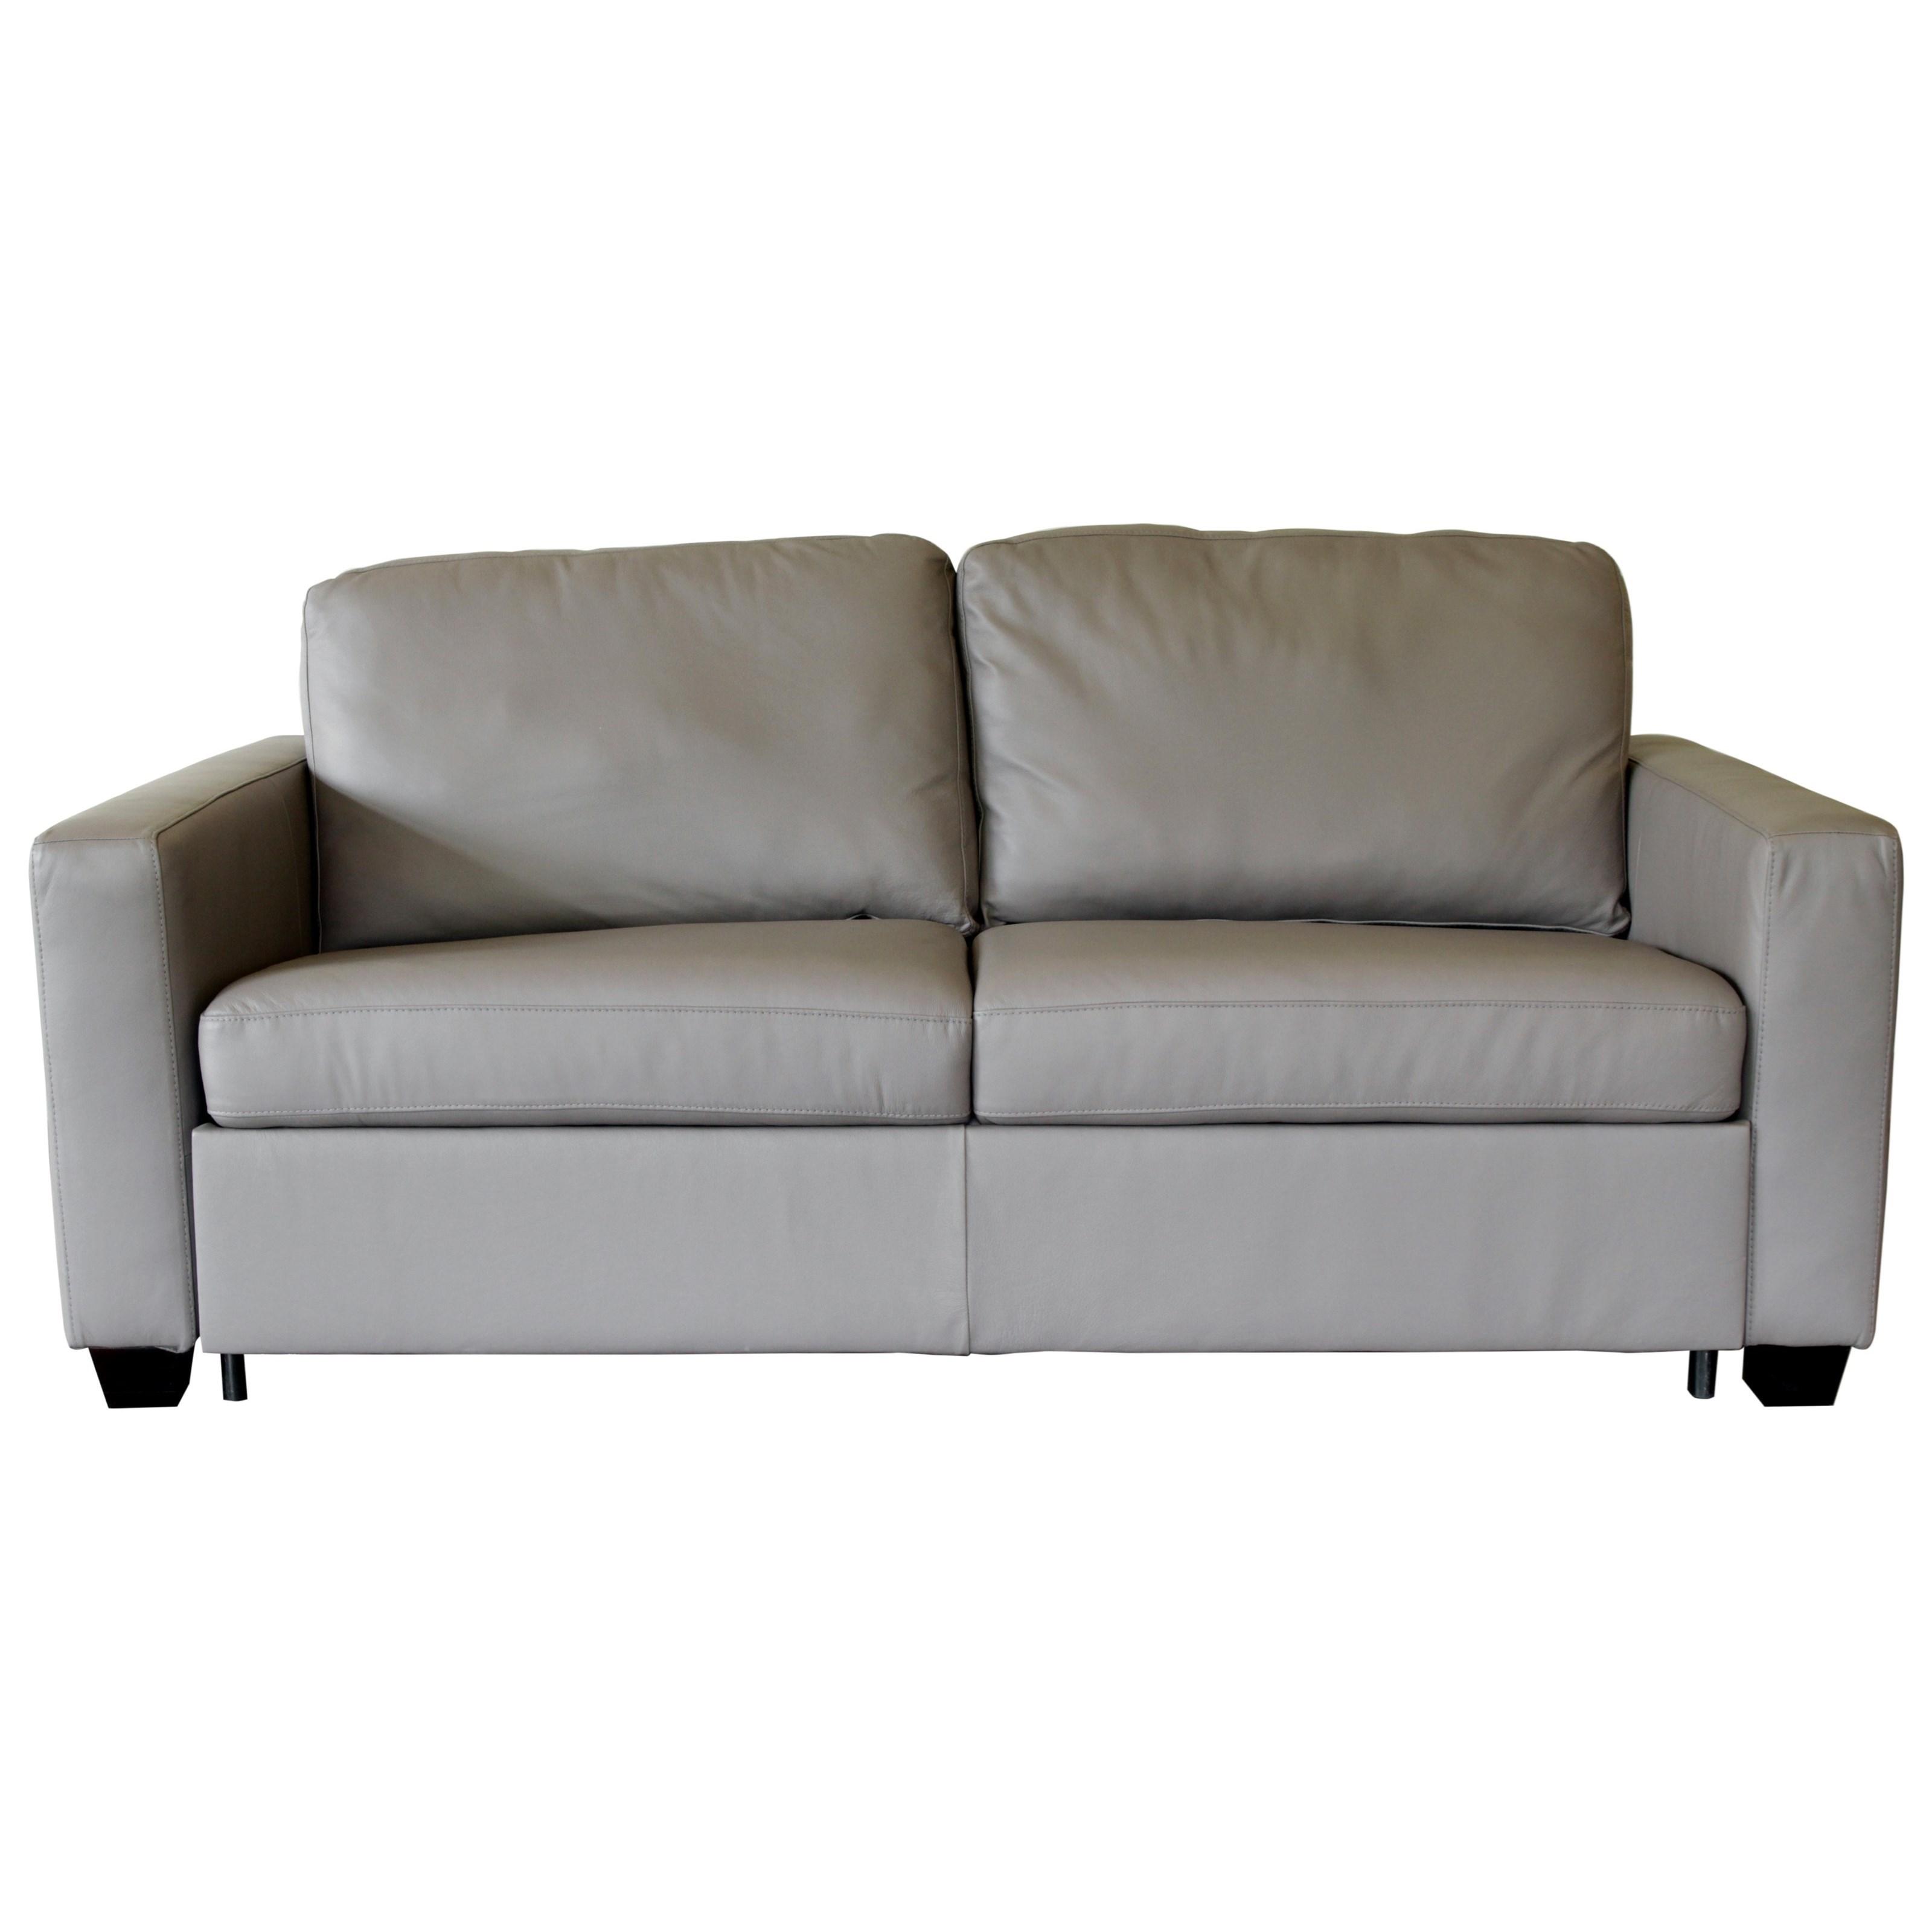 Kildonan Double Sofa Sleeper by Palliser at Jordan's Home Furnishings